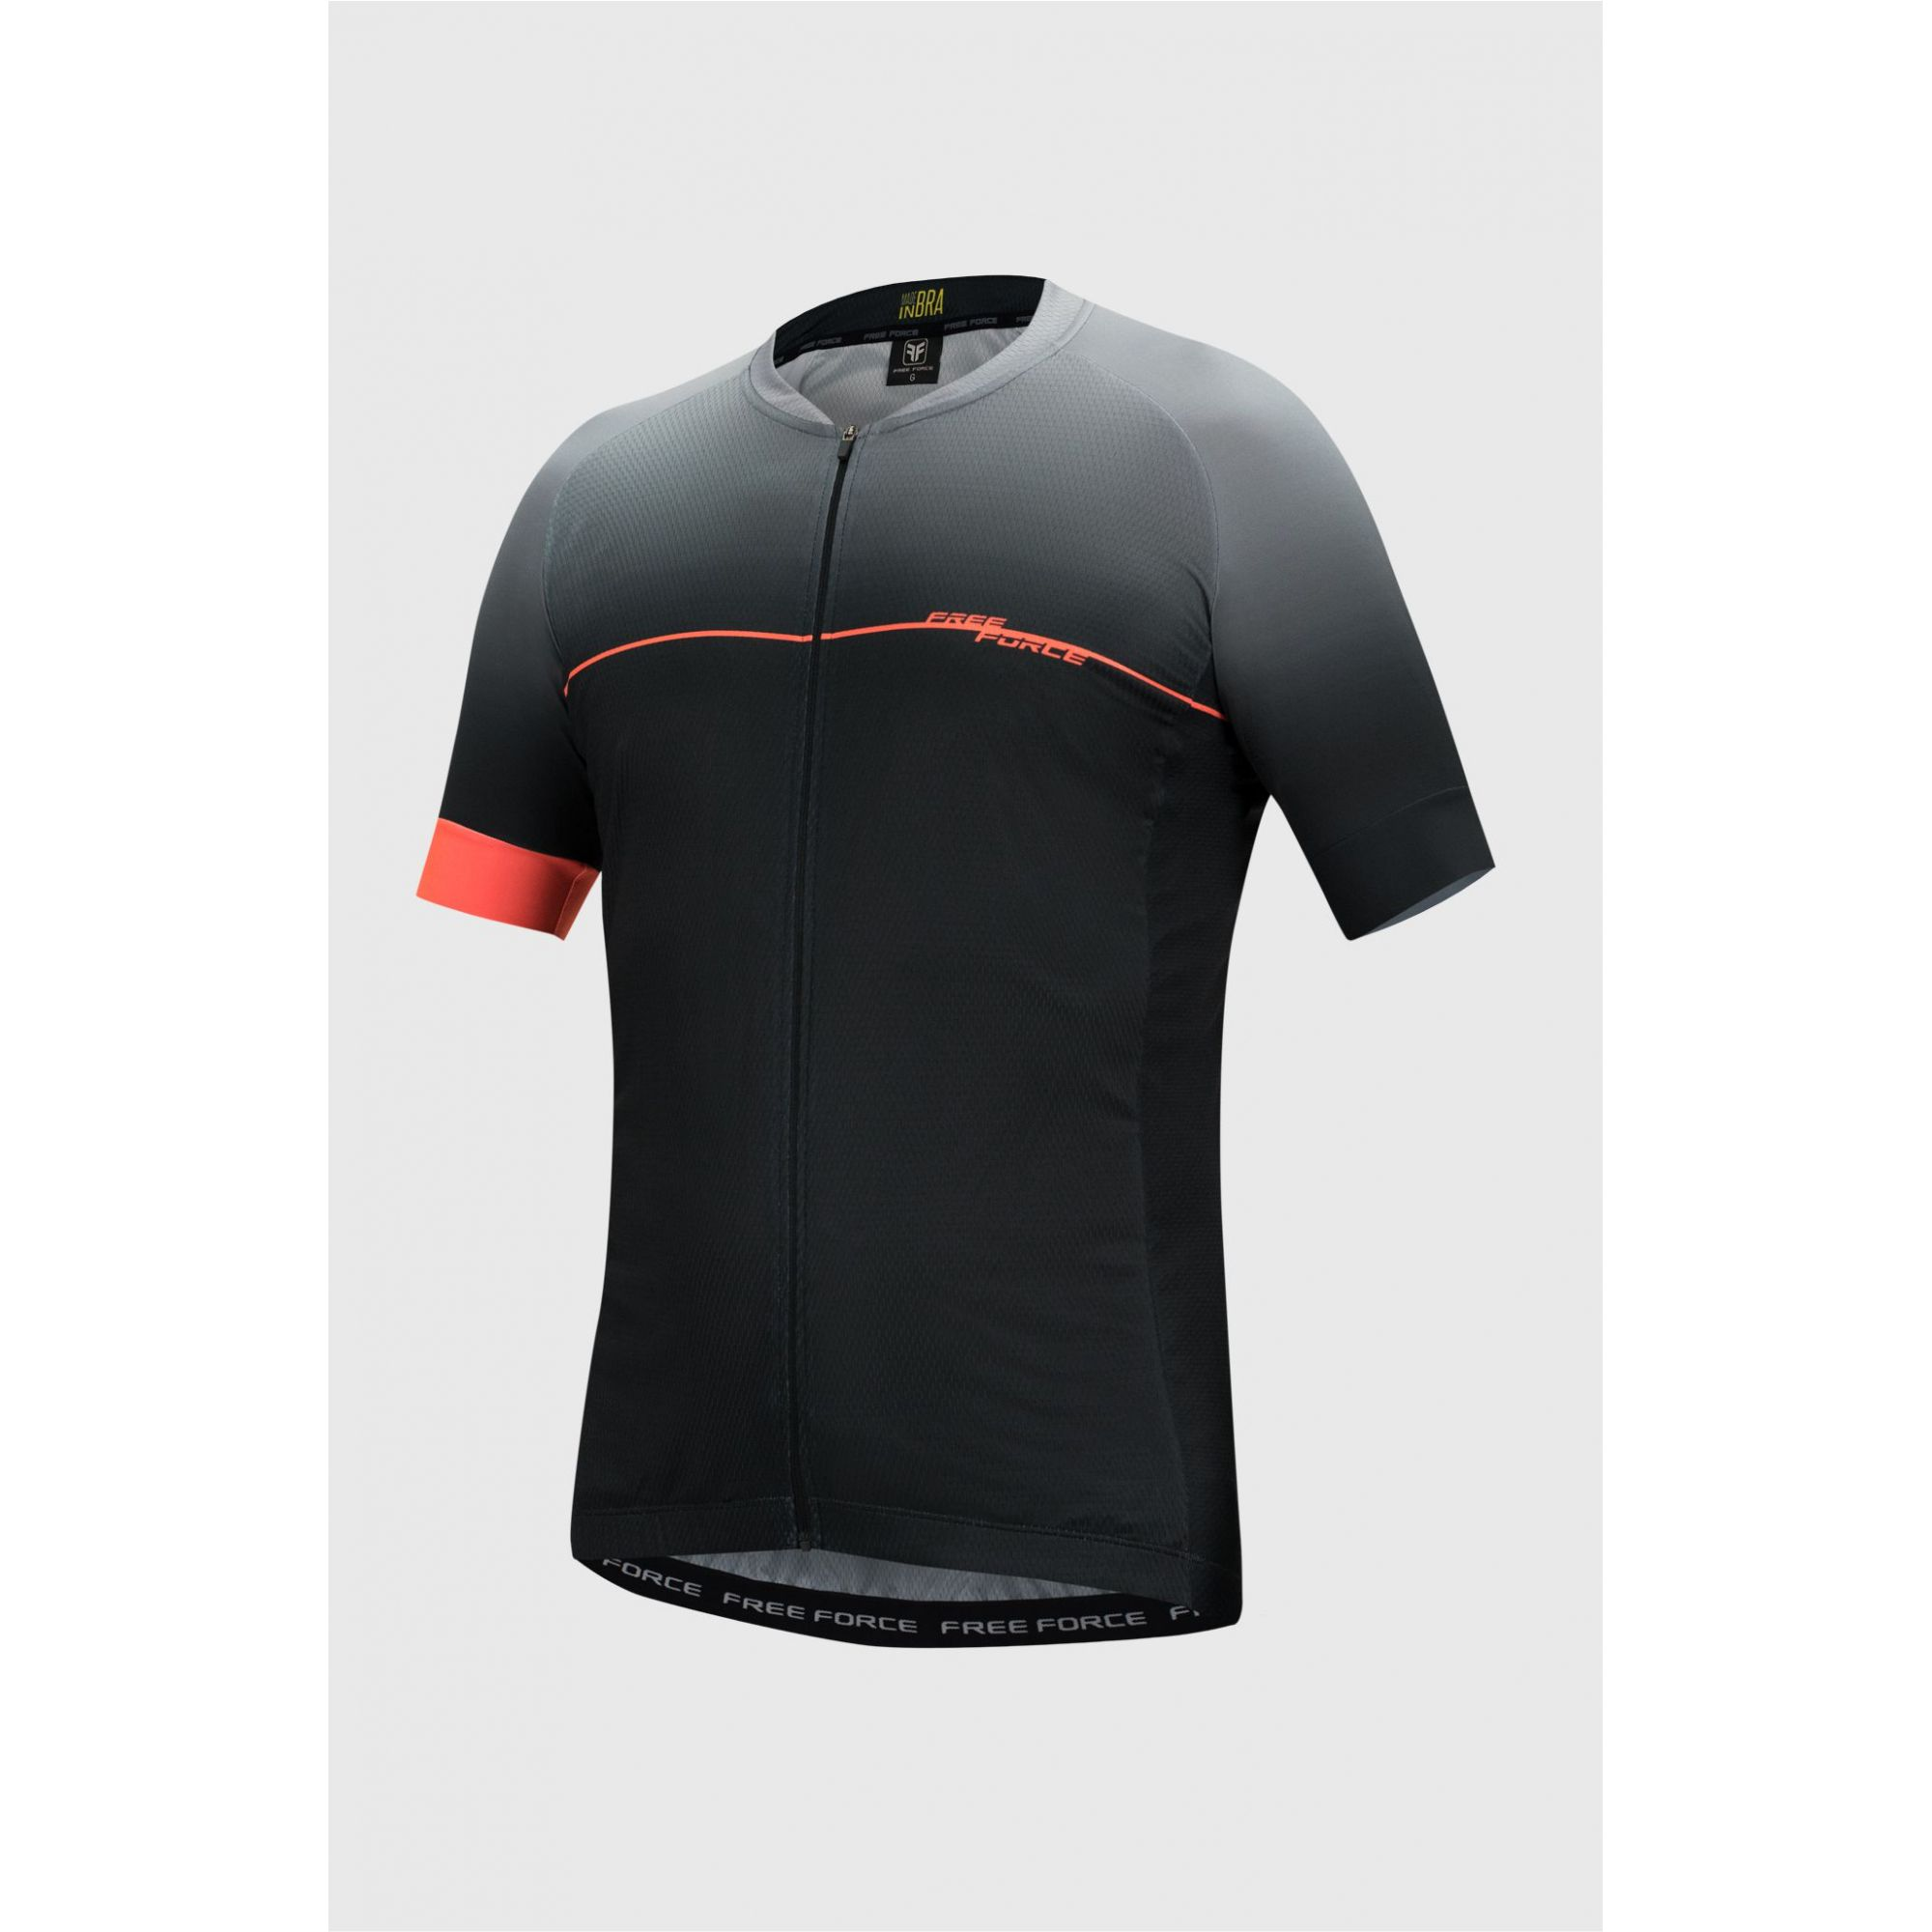 Camisa de Ciclismo Masculina Sport Vulk Free Force